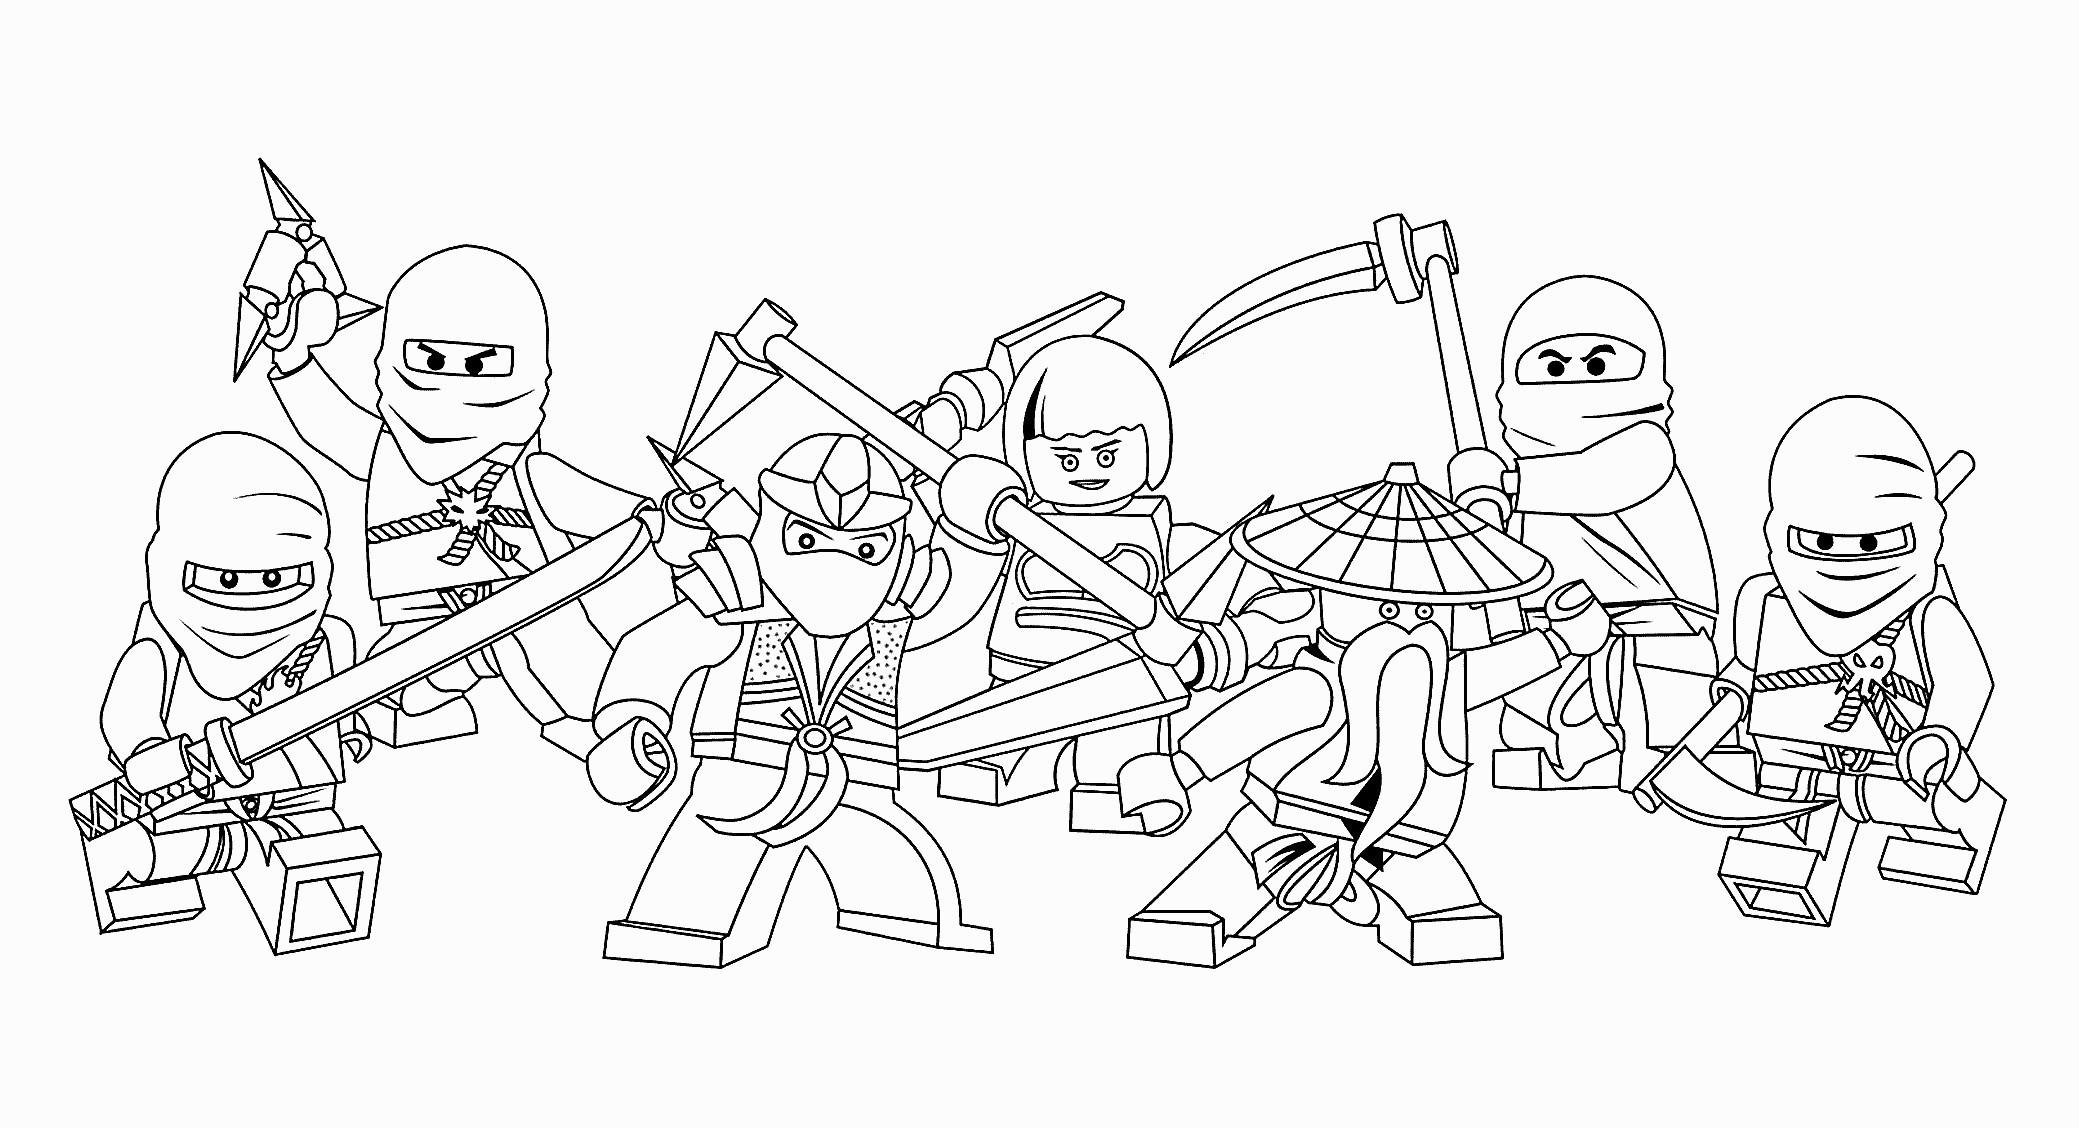 Ausmalbilder Ninjago Zum Ausdrucken Frisch Ninjago Ausmalbilder Zum Ausdrucken Neueste Modelle Lego Ninjago Sammlung